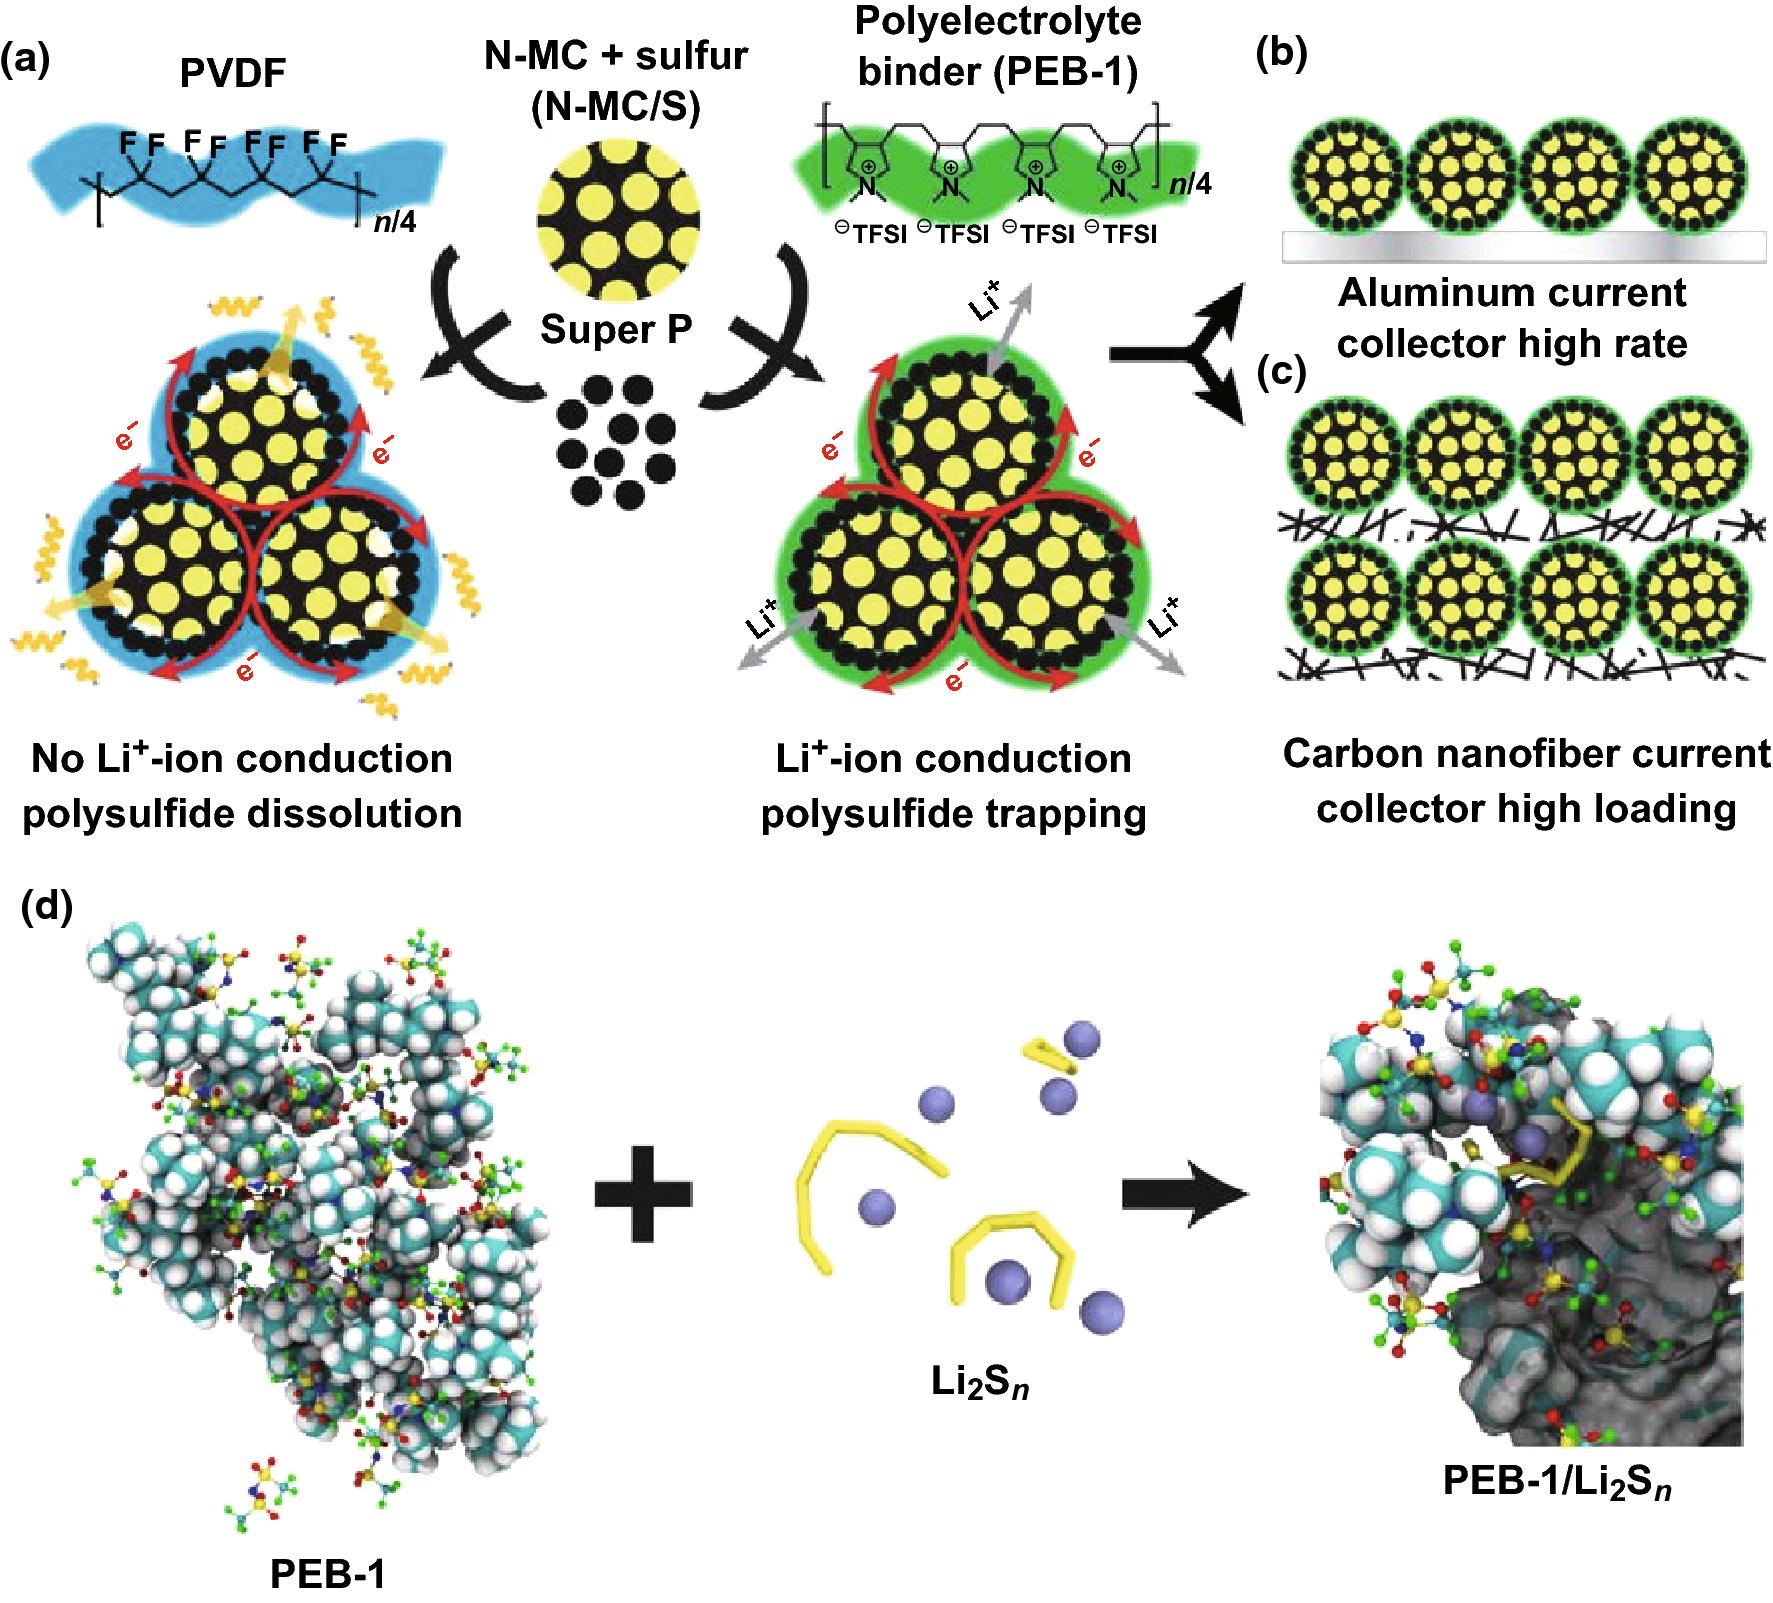 Housing Sulfur In Polymer Composite Frameworks For Li–S